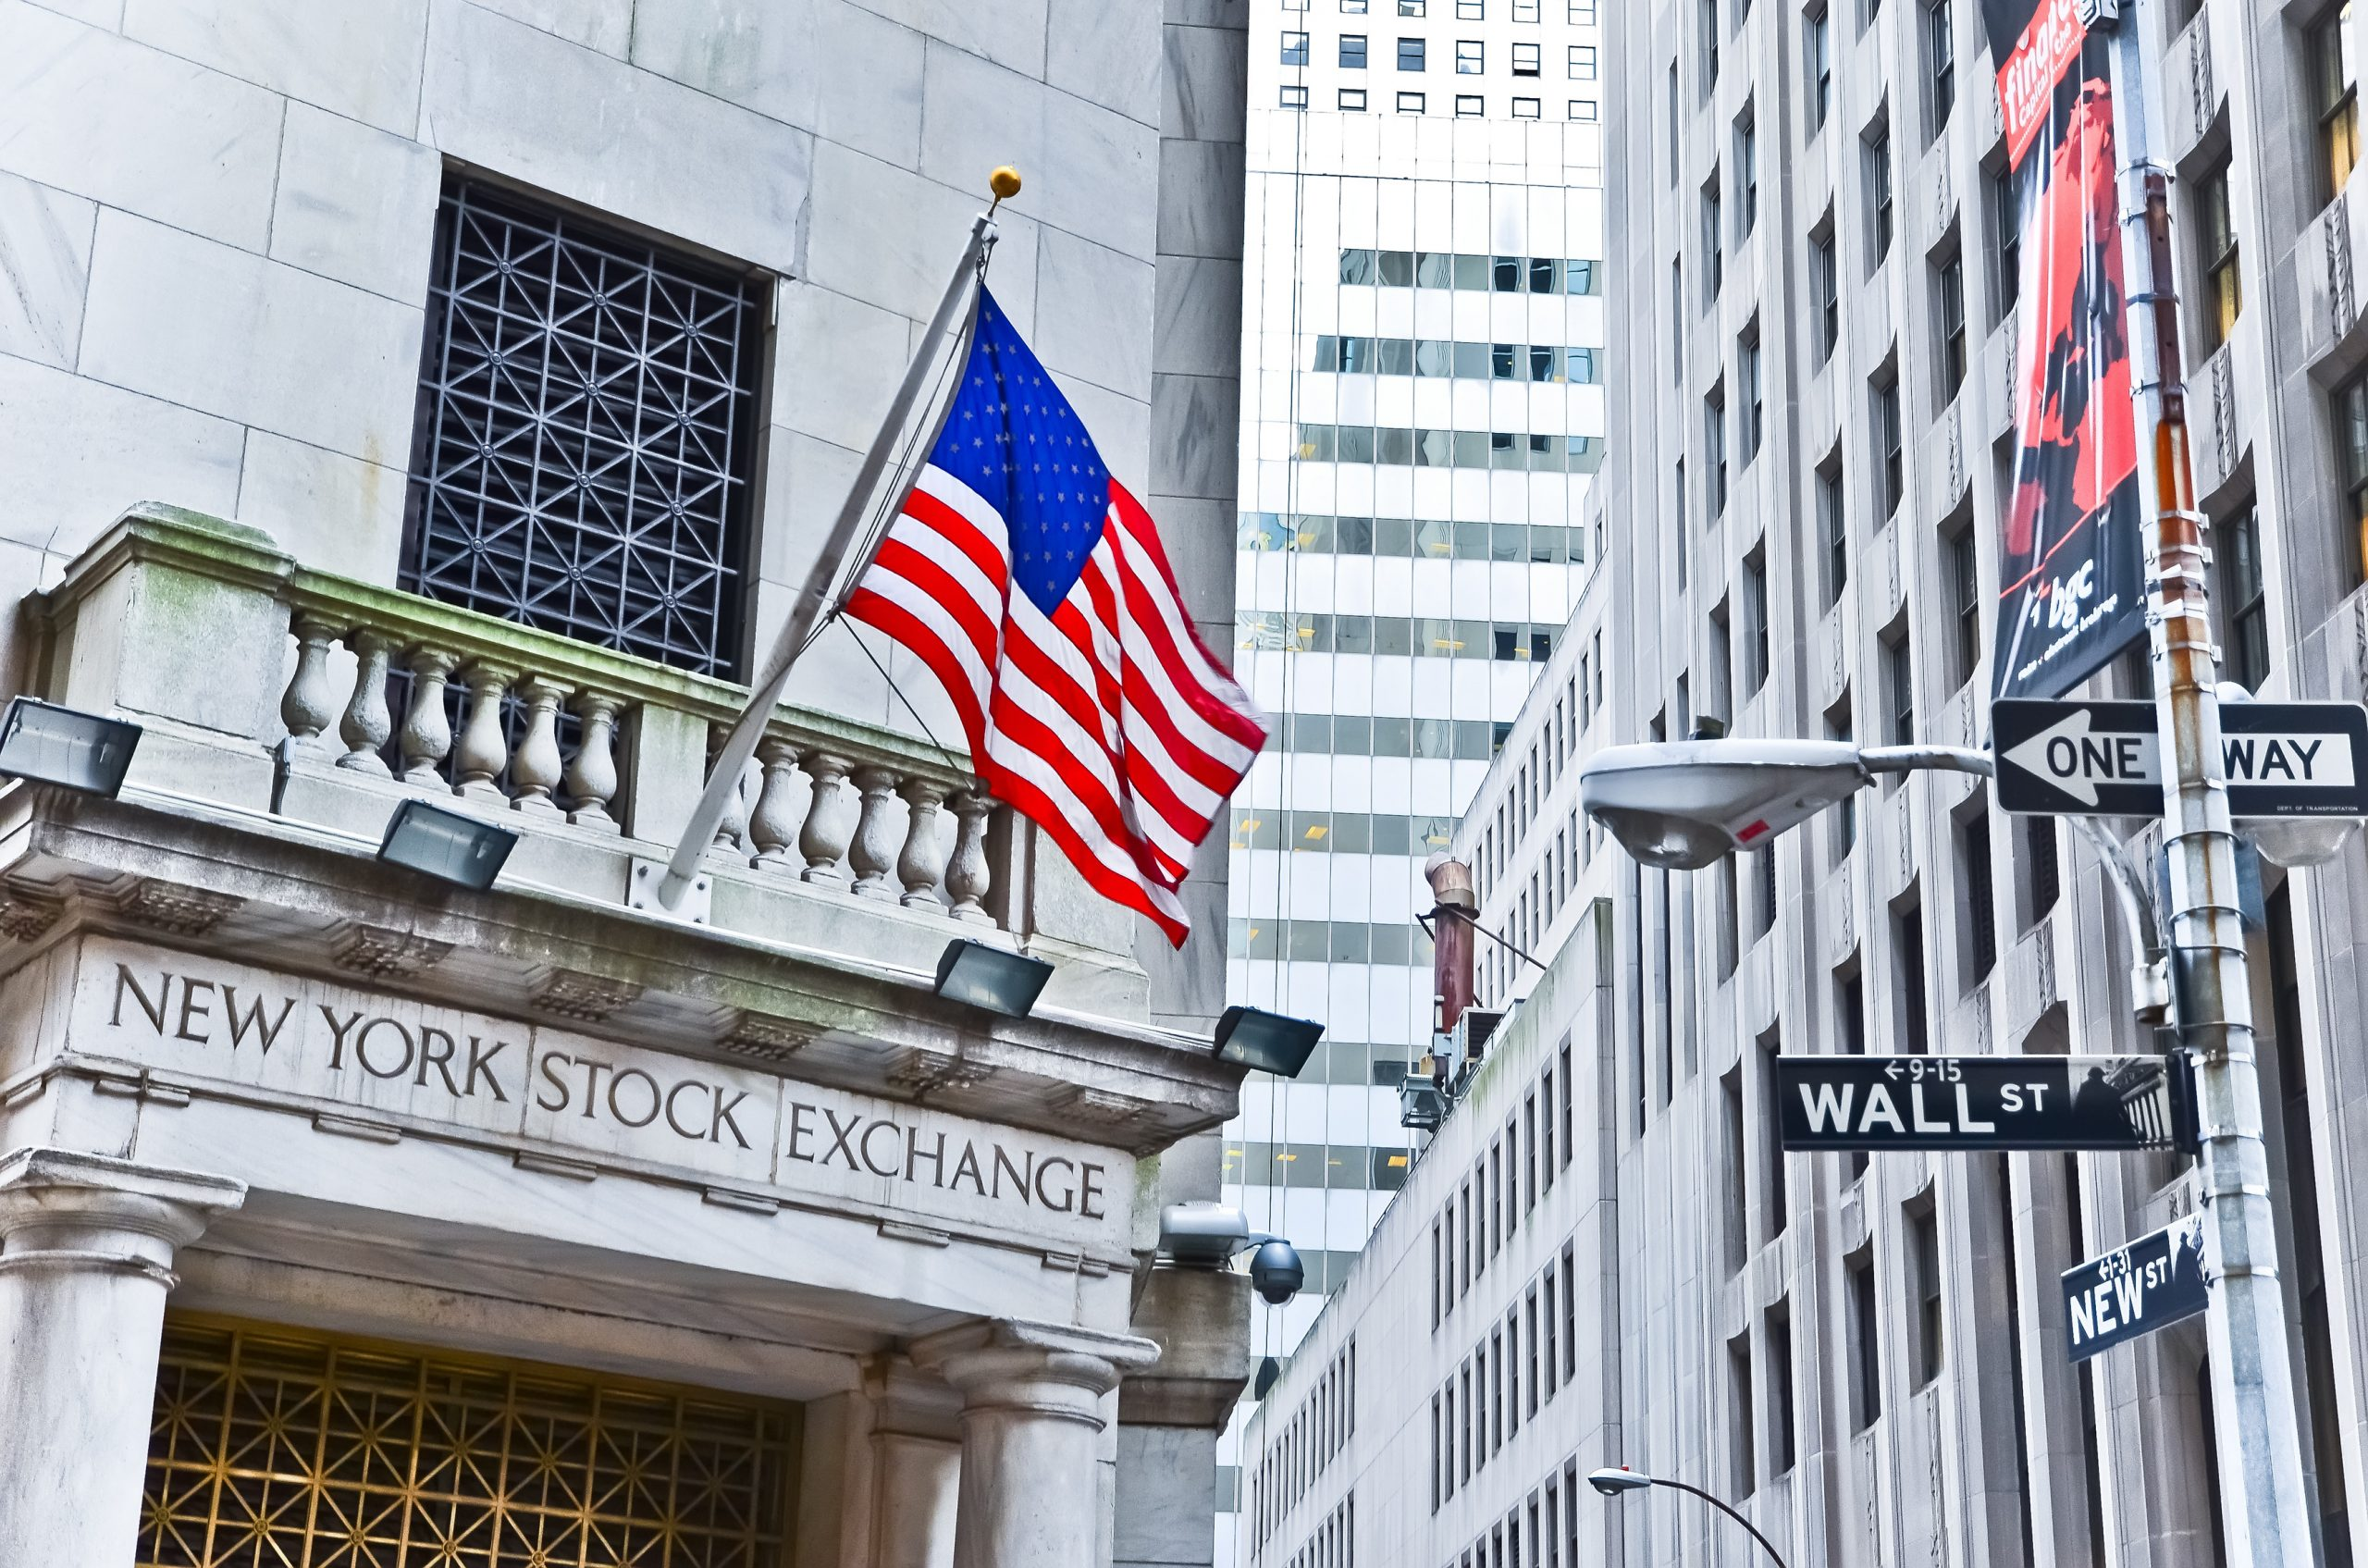 The New York Stock Exchange on Wall Street.